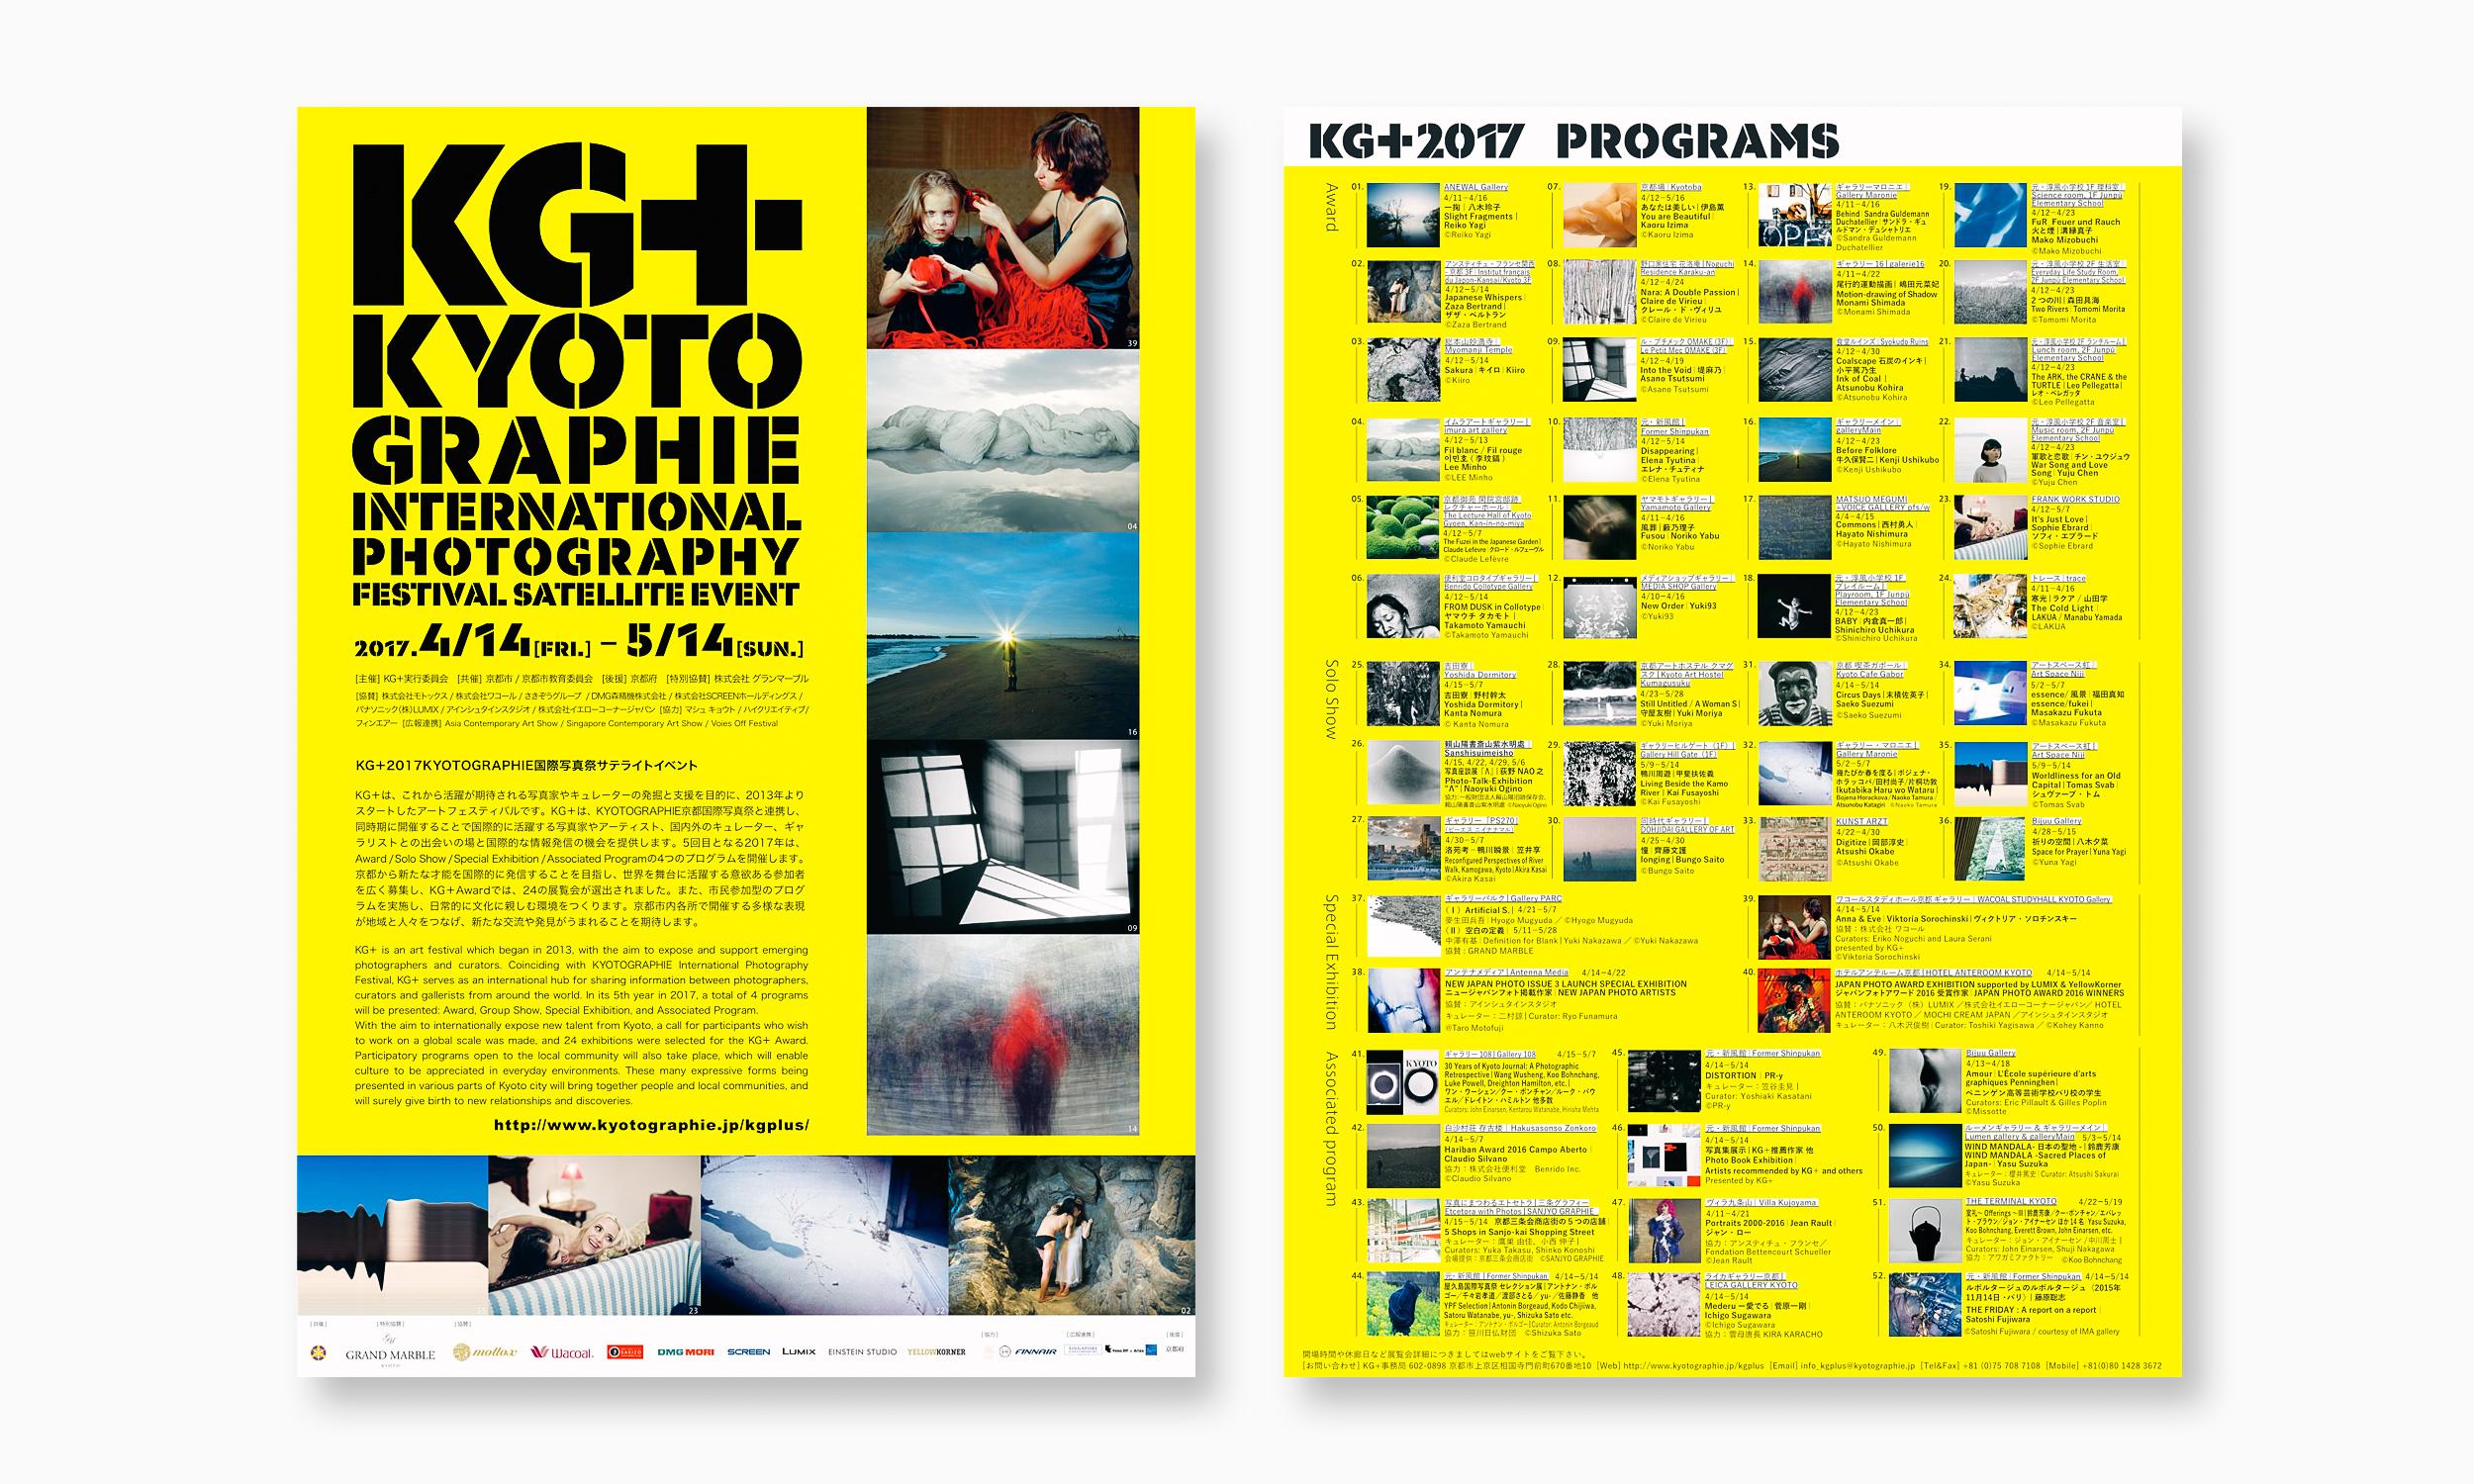 KG+ KYOTOGRAPHIE Satellite Event